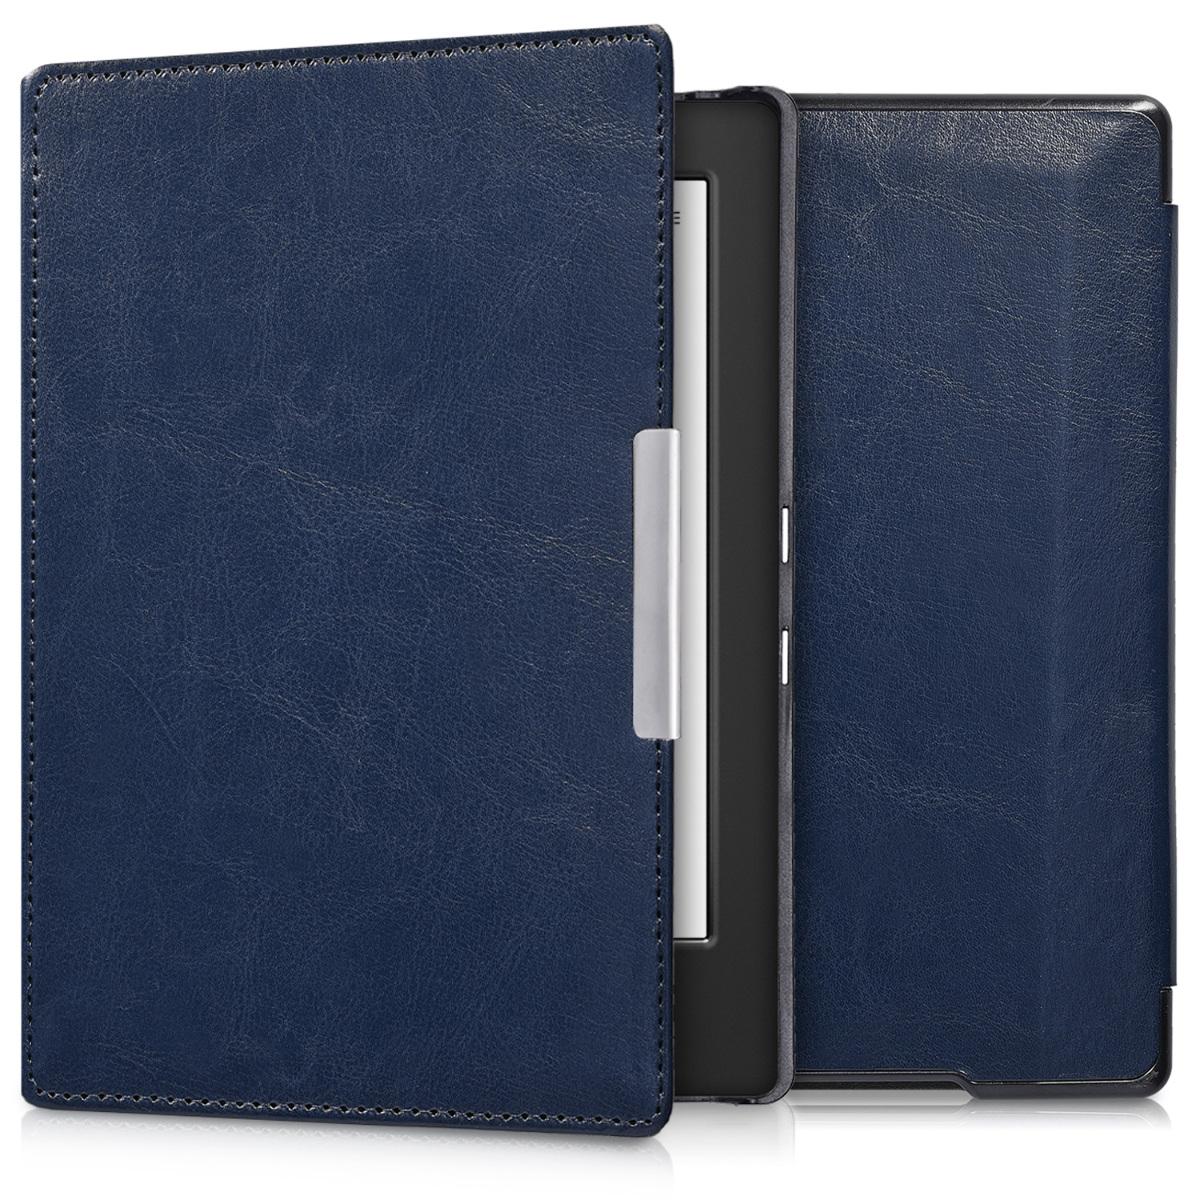 Flip cover for kobo aura h2o edition 1 dark blue for Housse kobo aura h2o edition 2